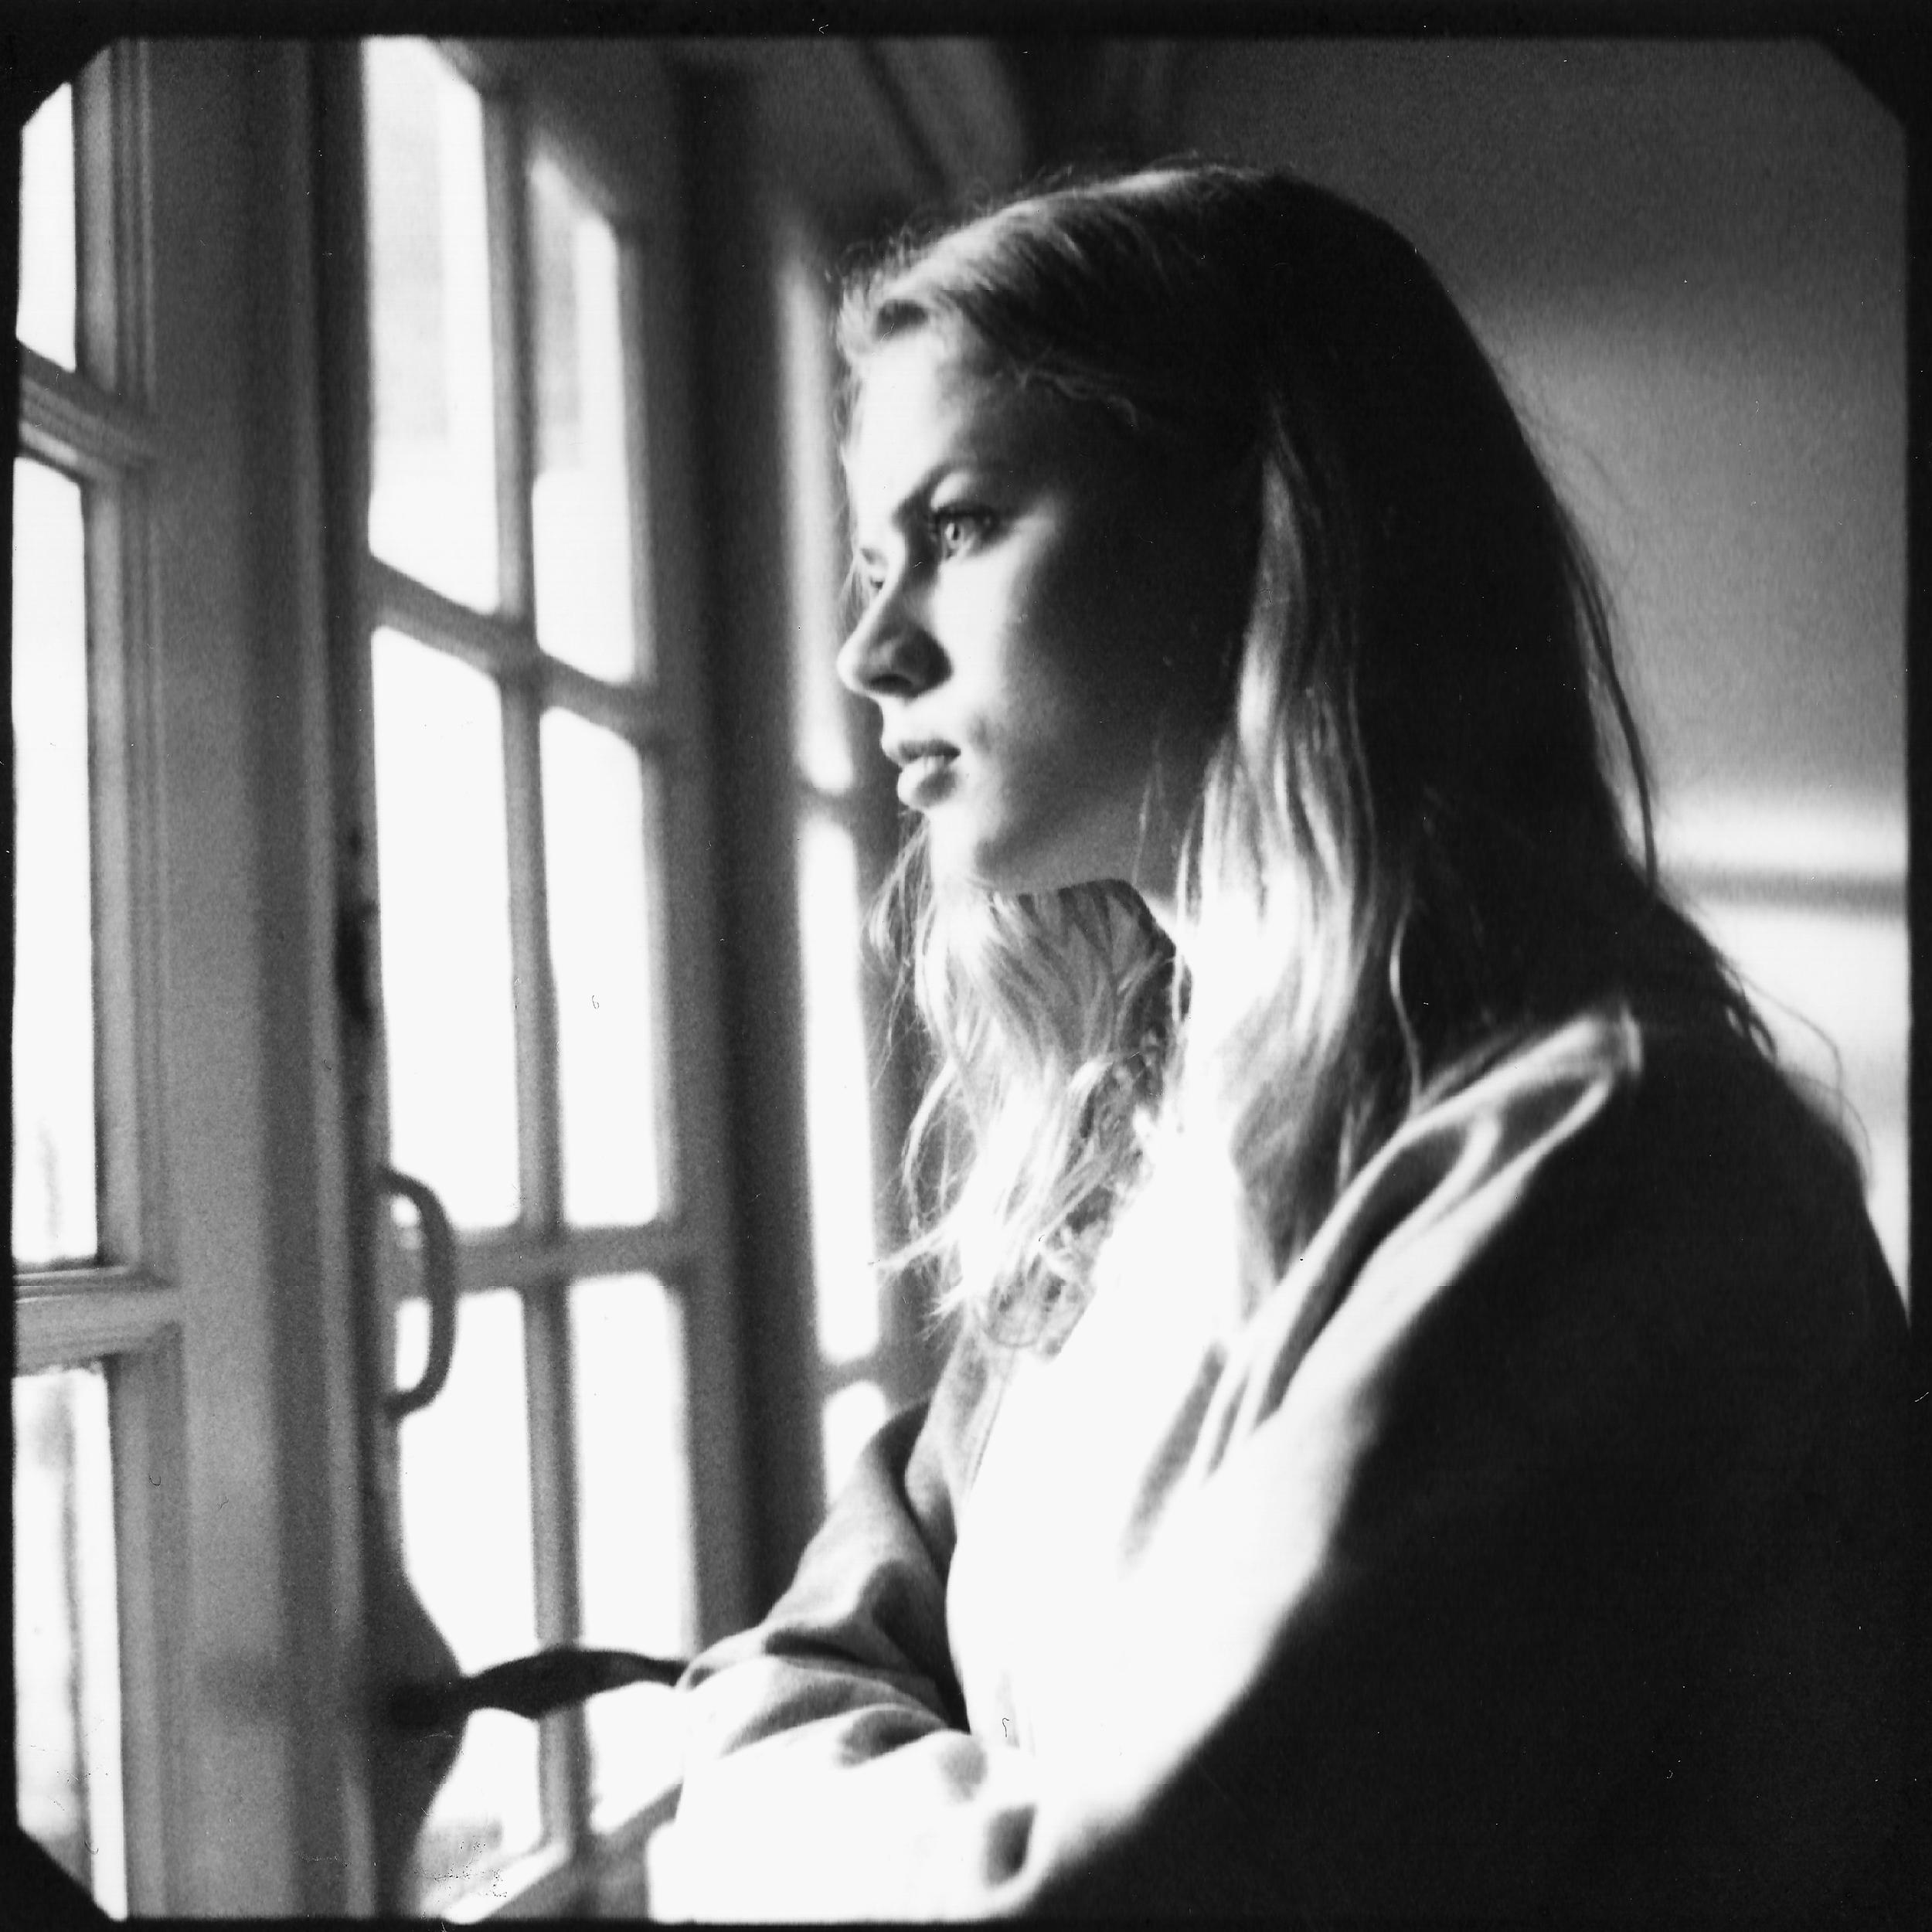 Actress Pien Bennen on the set of 'Choices' (2017) Shot onblack and white peel apart polaroid